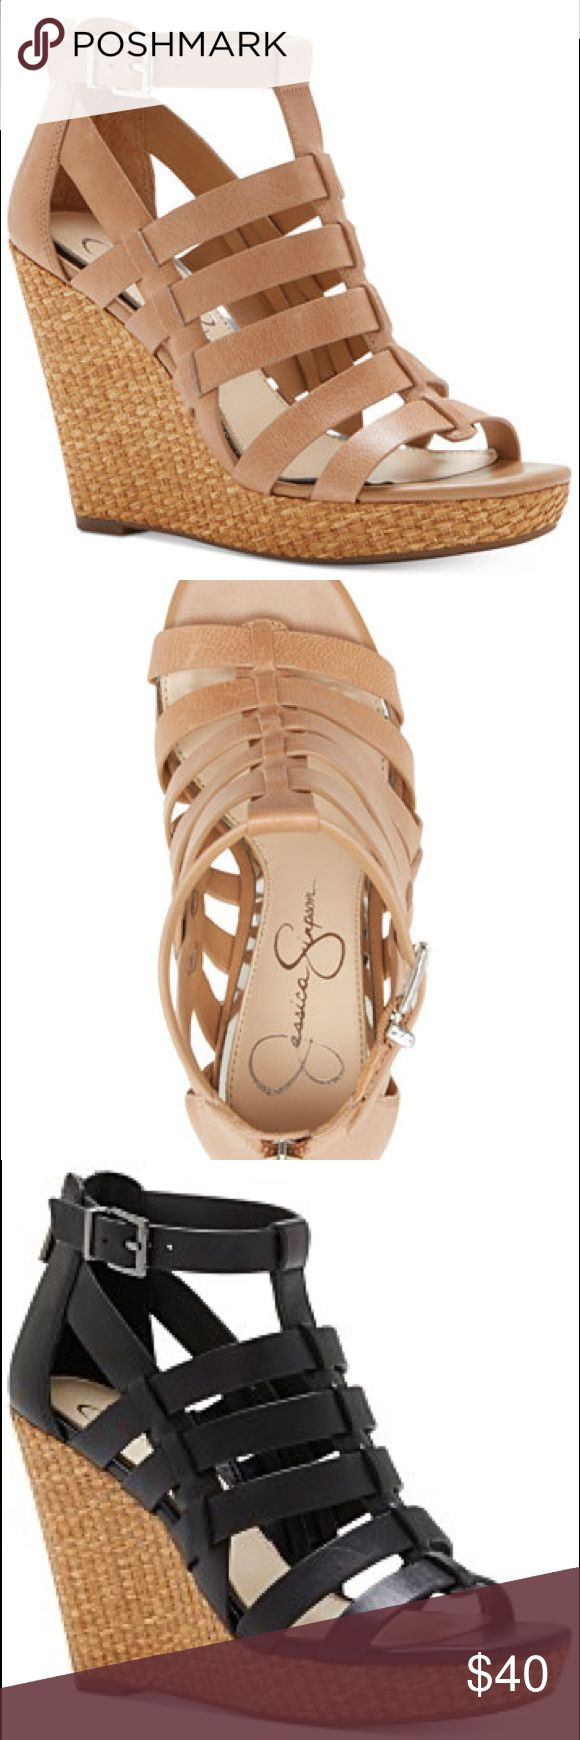 "Jessica Simpson wedge heels Jessica Simpson wedge heels Black and Tan 4"" inch wedge 3/4 platform. Shoes Wedges"